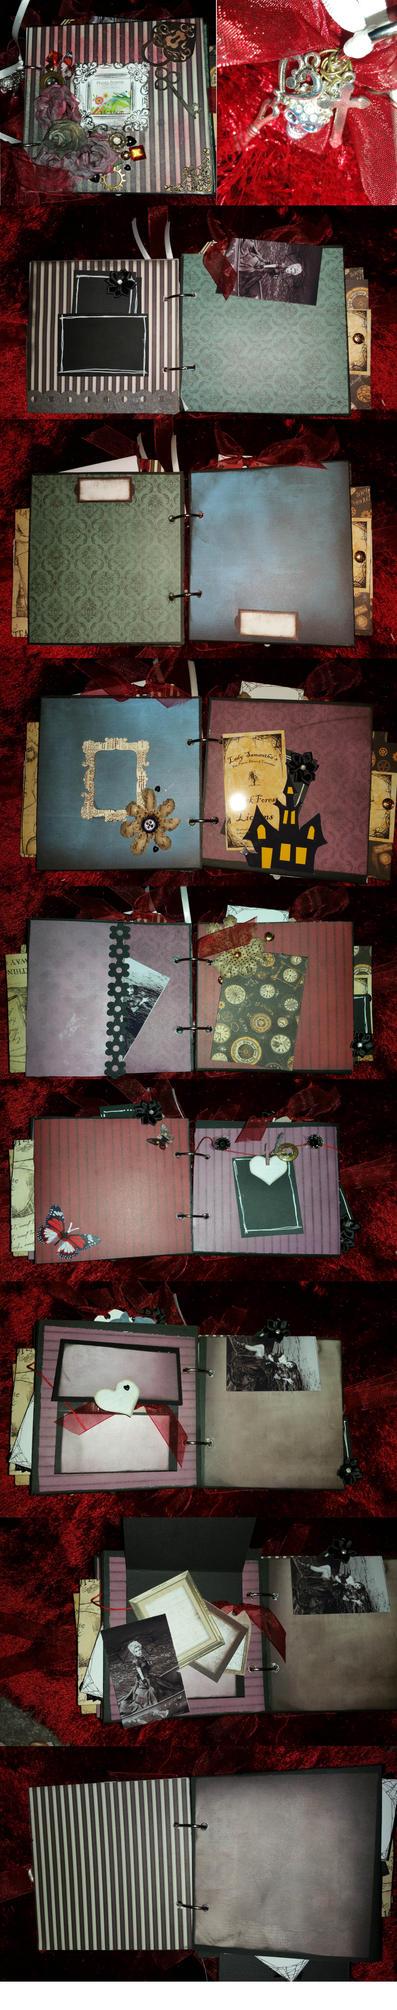 Gothic Scrapbook 6x6 Mini Album/Journalling by Hazey1988